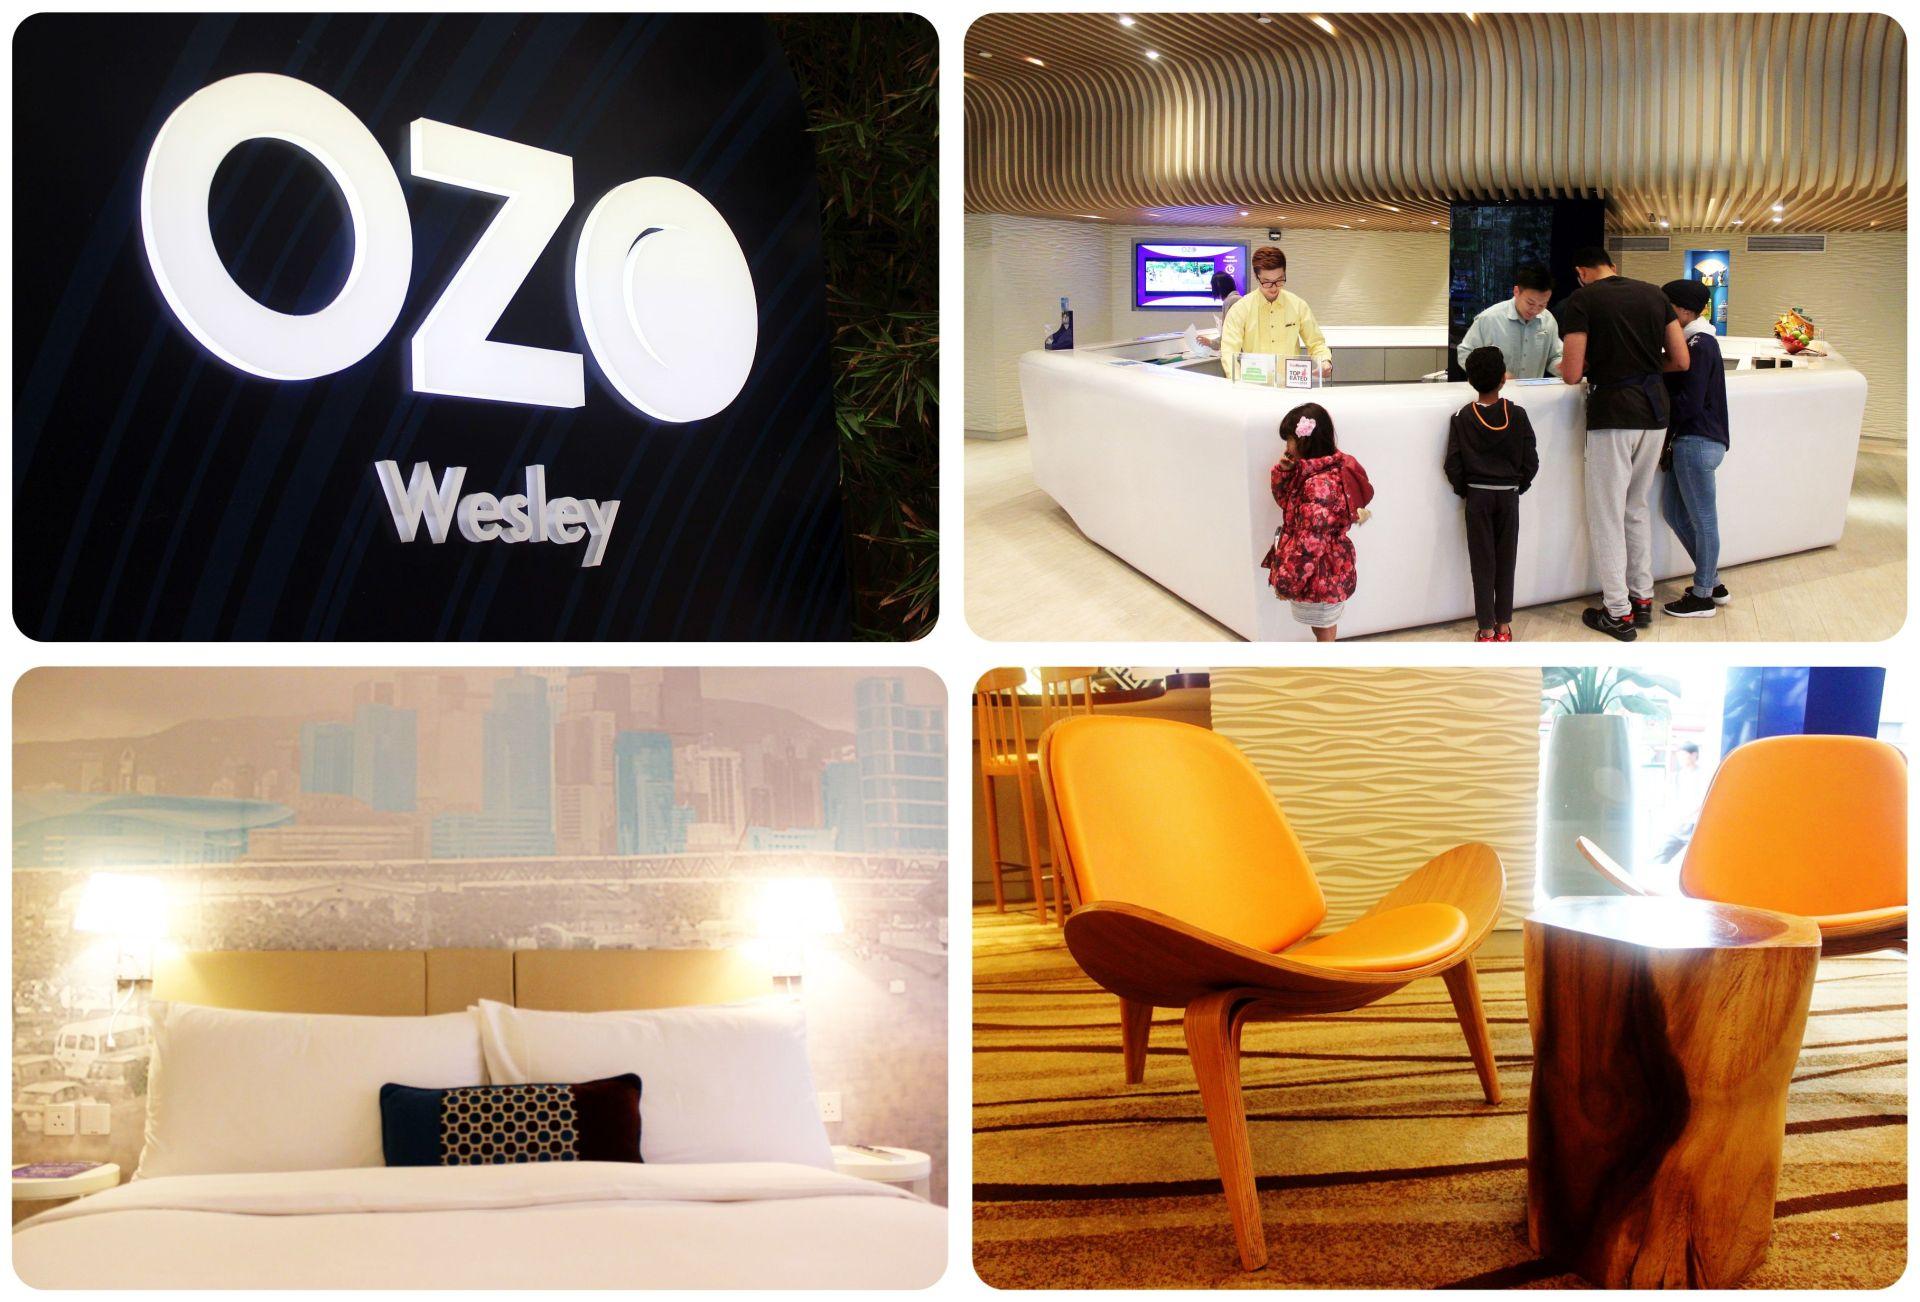 Hong Kong Ozo Wesley Hotel